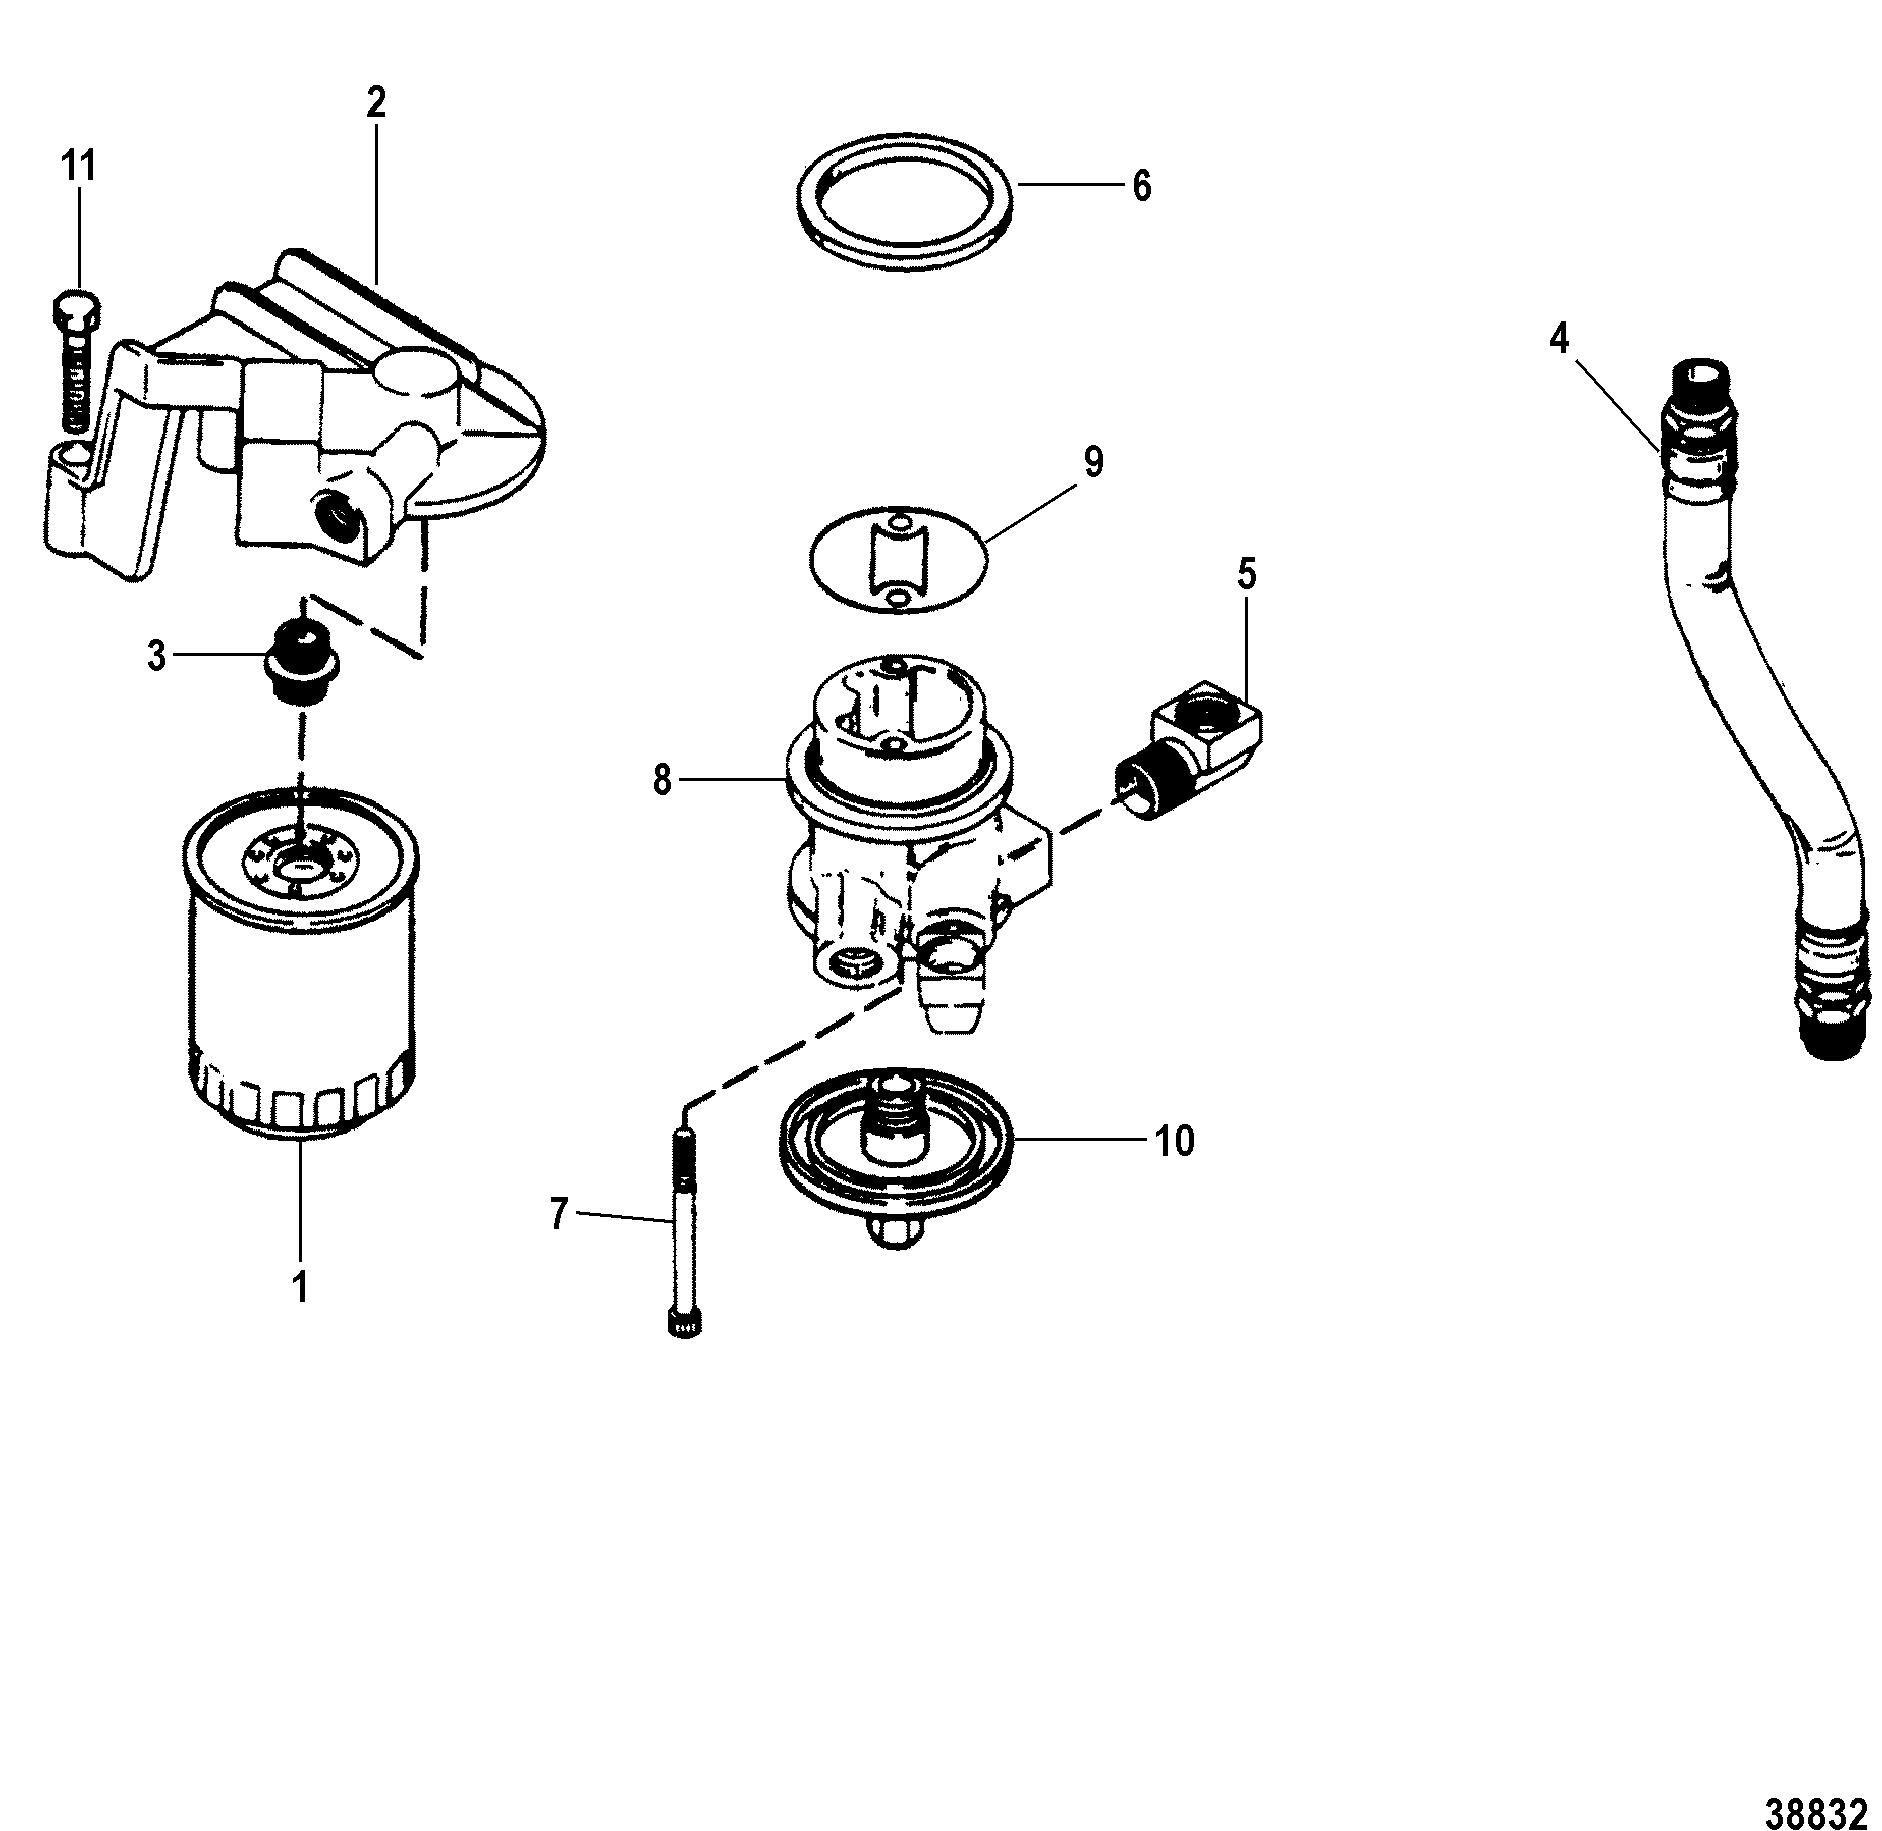 4 3lx mercruiser remote oil filter kit 1996  4  free